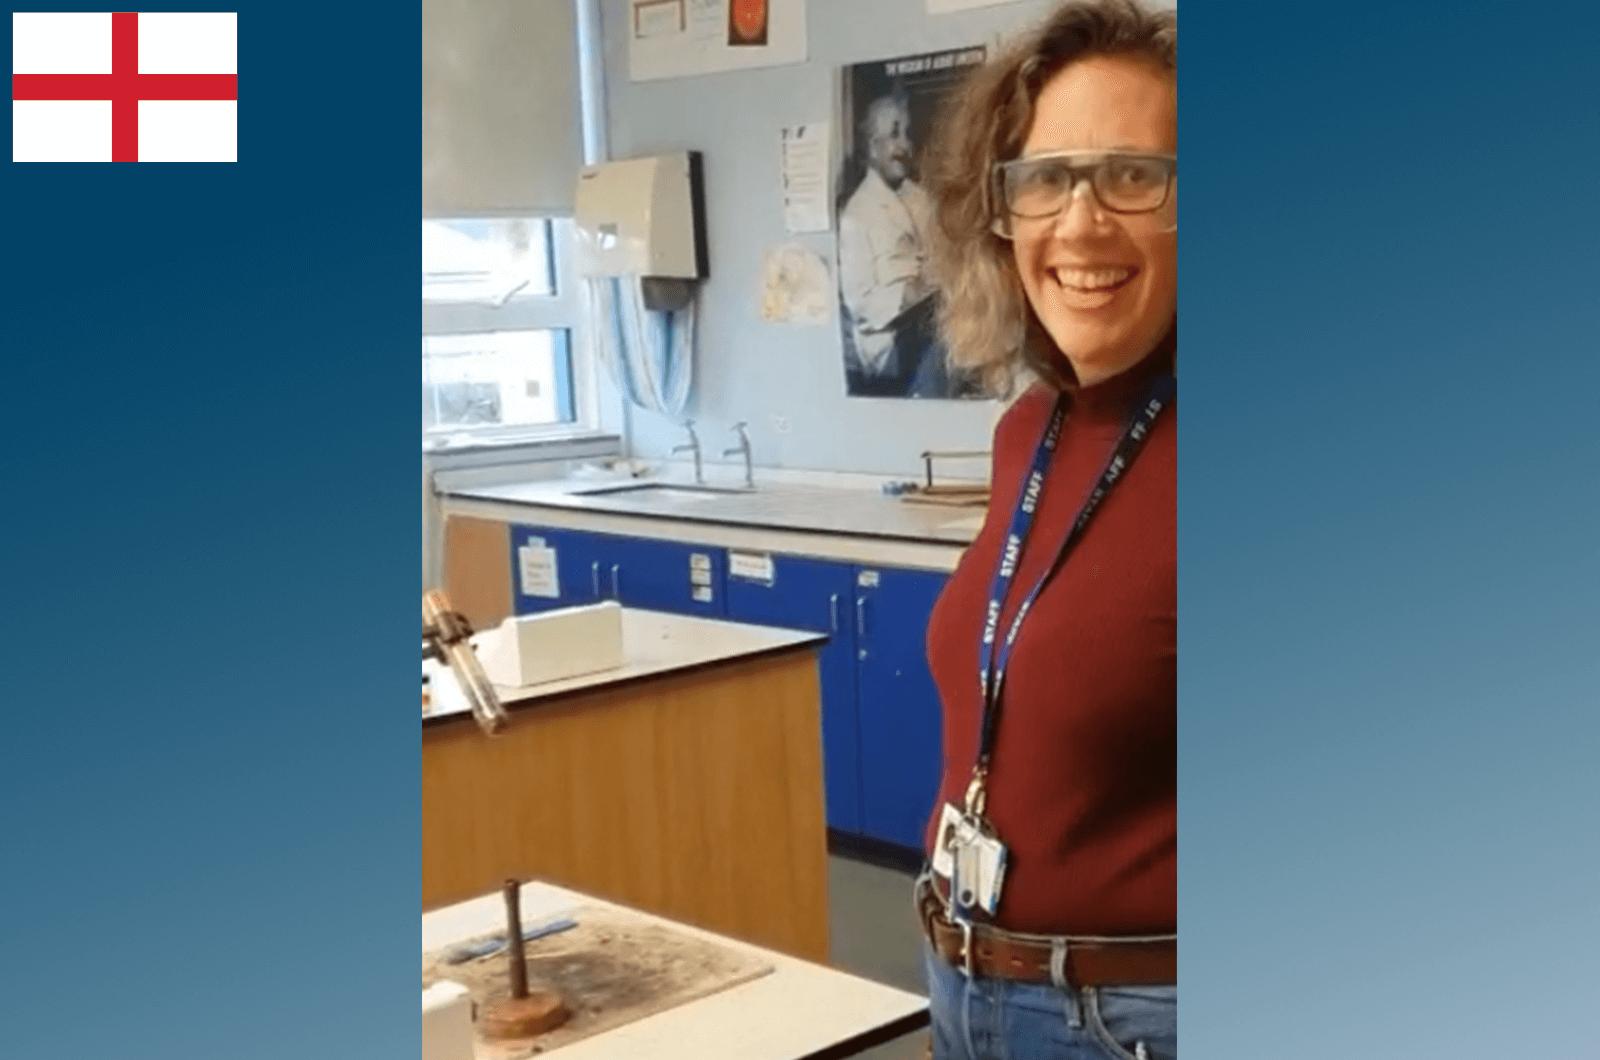 Woman wearing lanyard and smiling while teaching at school